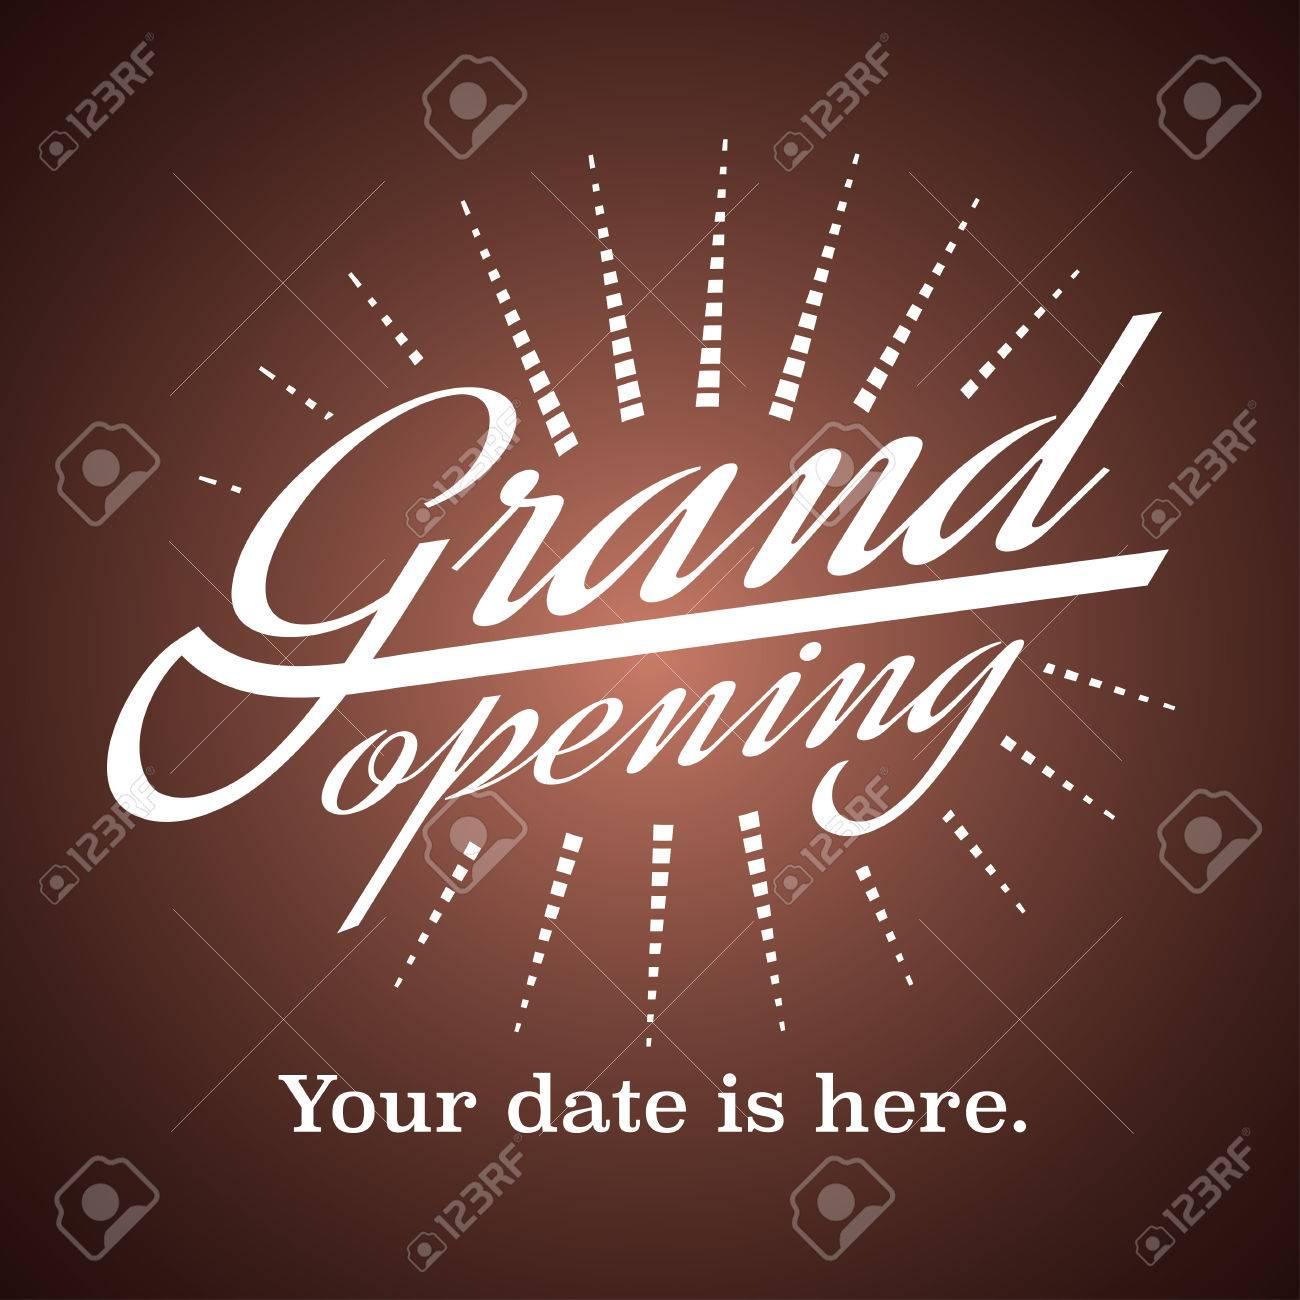 Grand opening invitation template eliolera 100 grand opening invitation template sample invitation for stopboris Choice Image